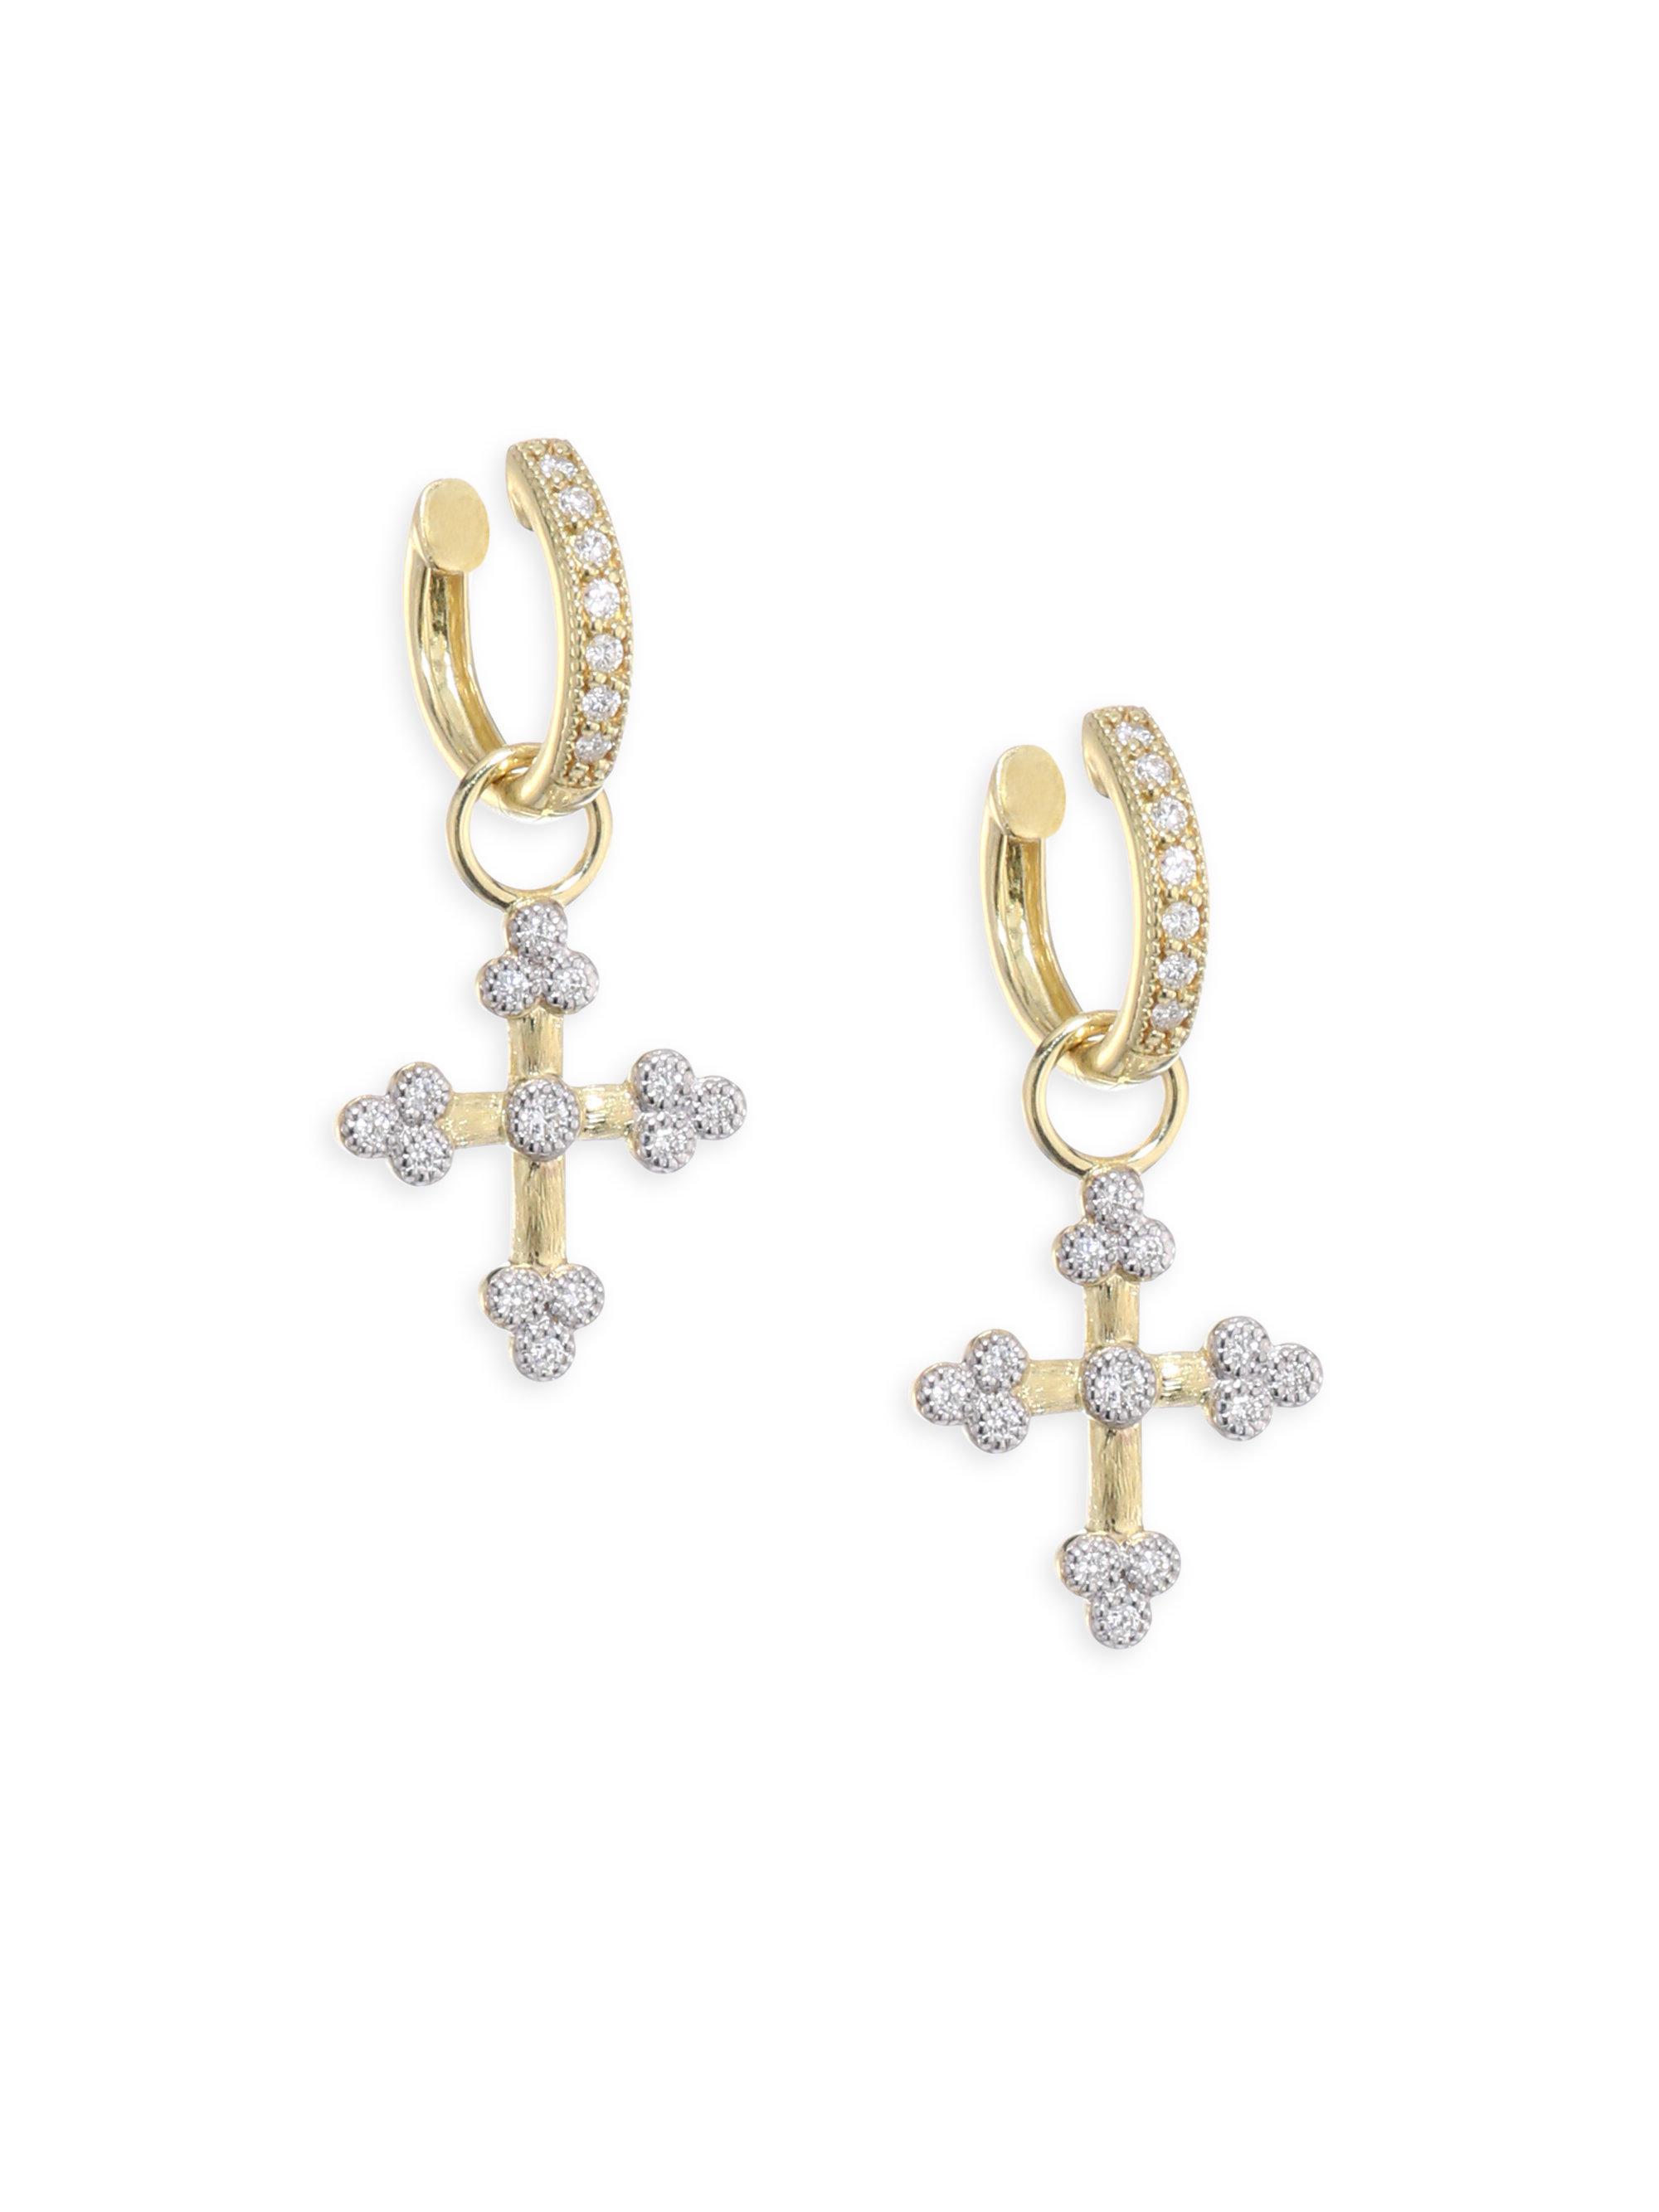 Jude Frances Women S Metallic Provence Tiny Diamond Cross Earring Charms